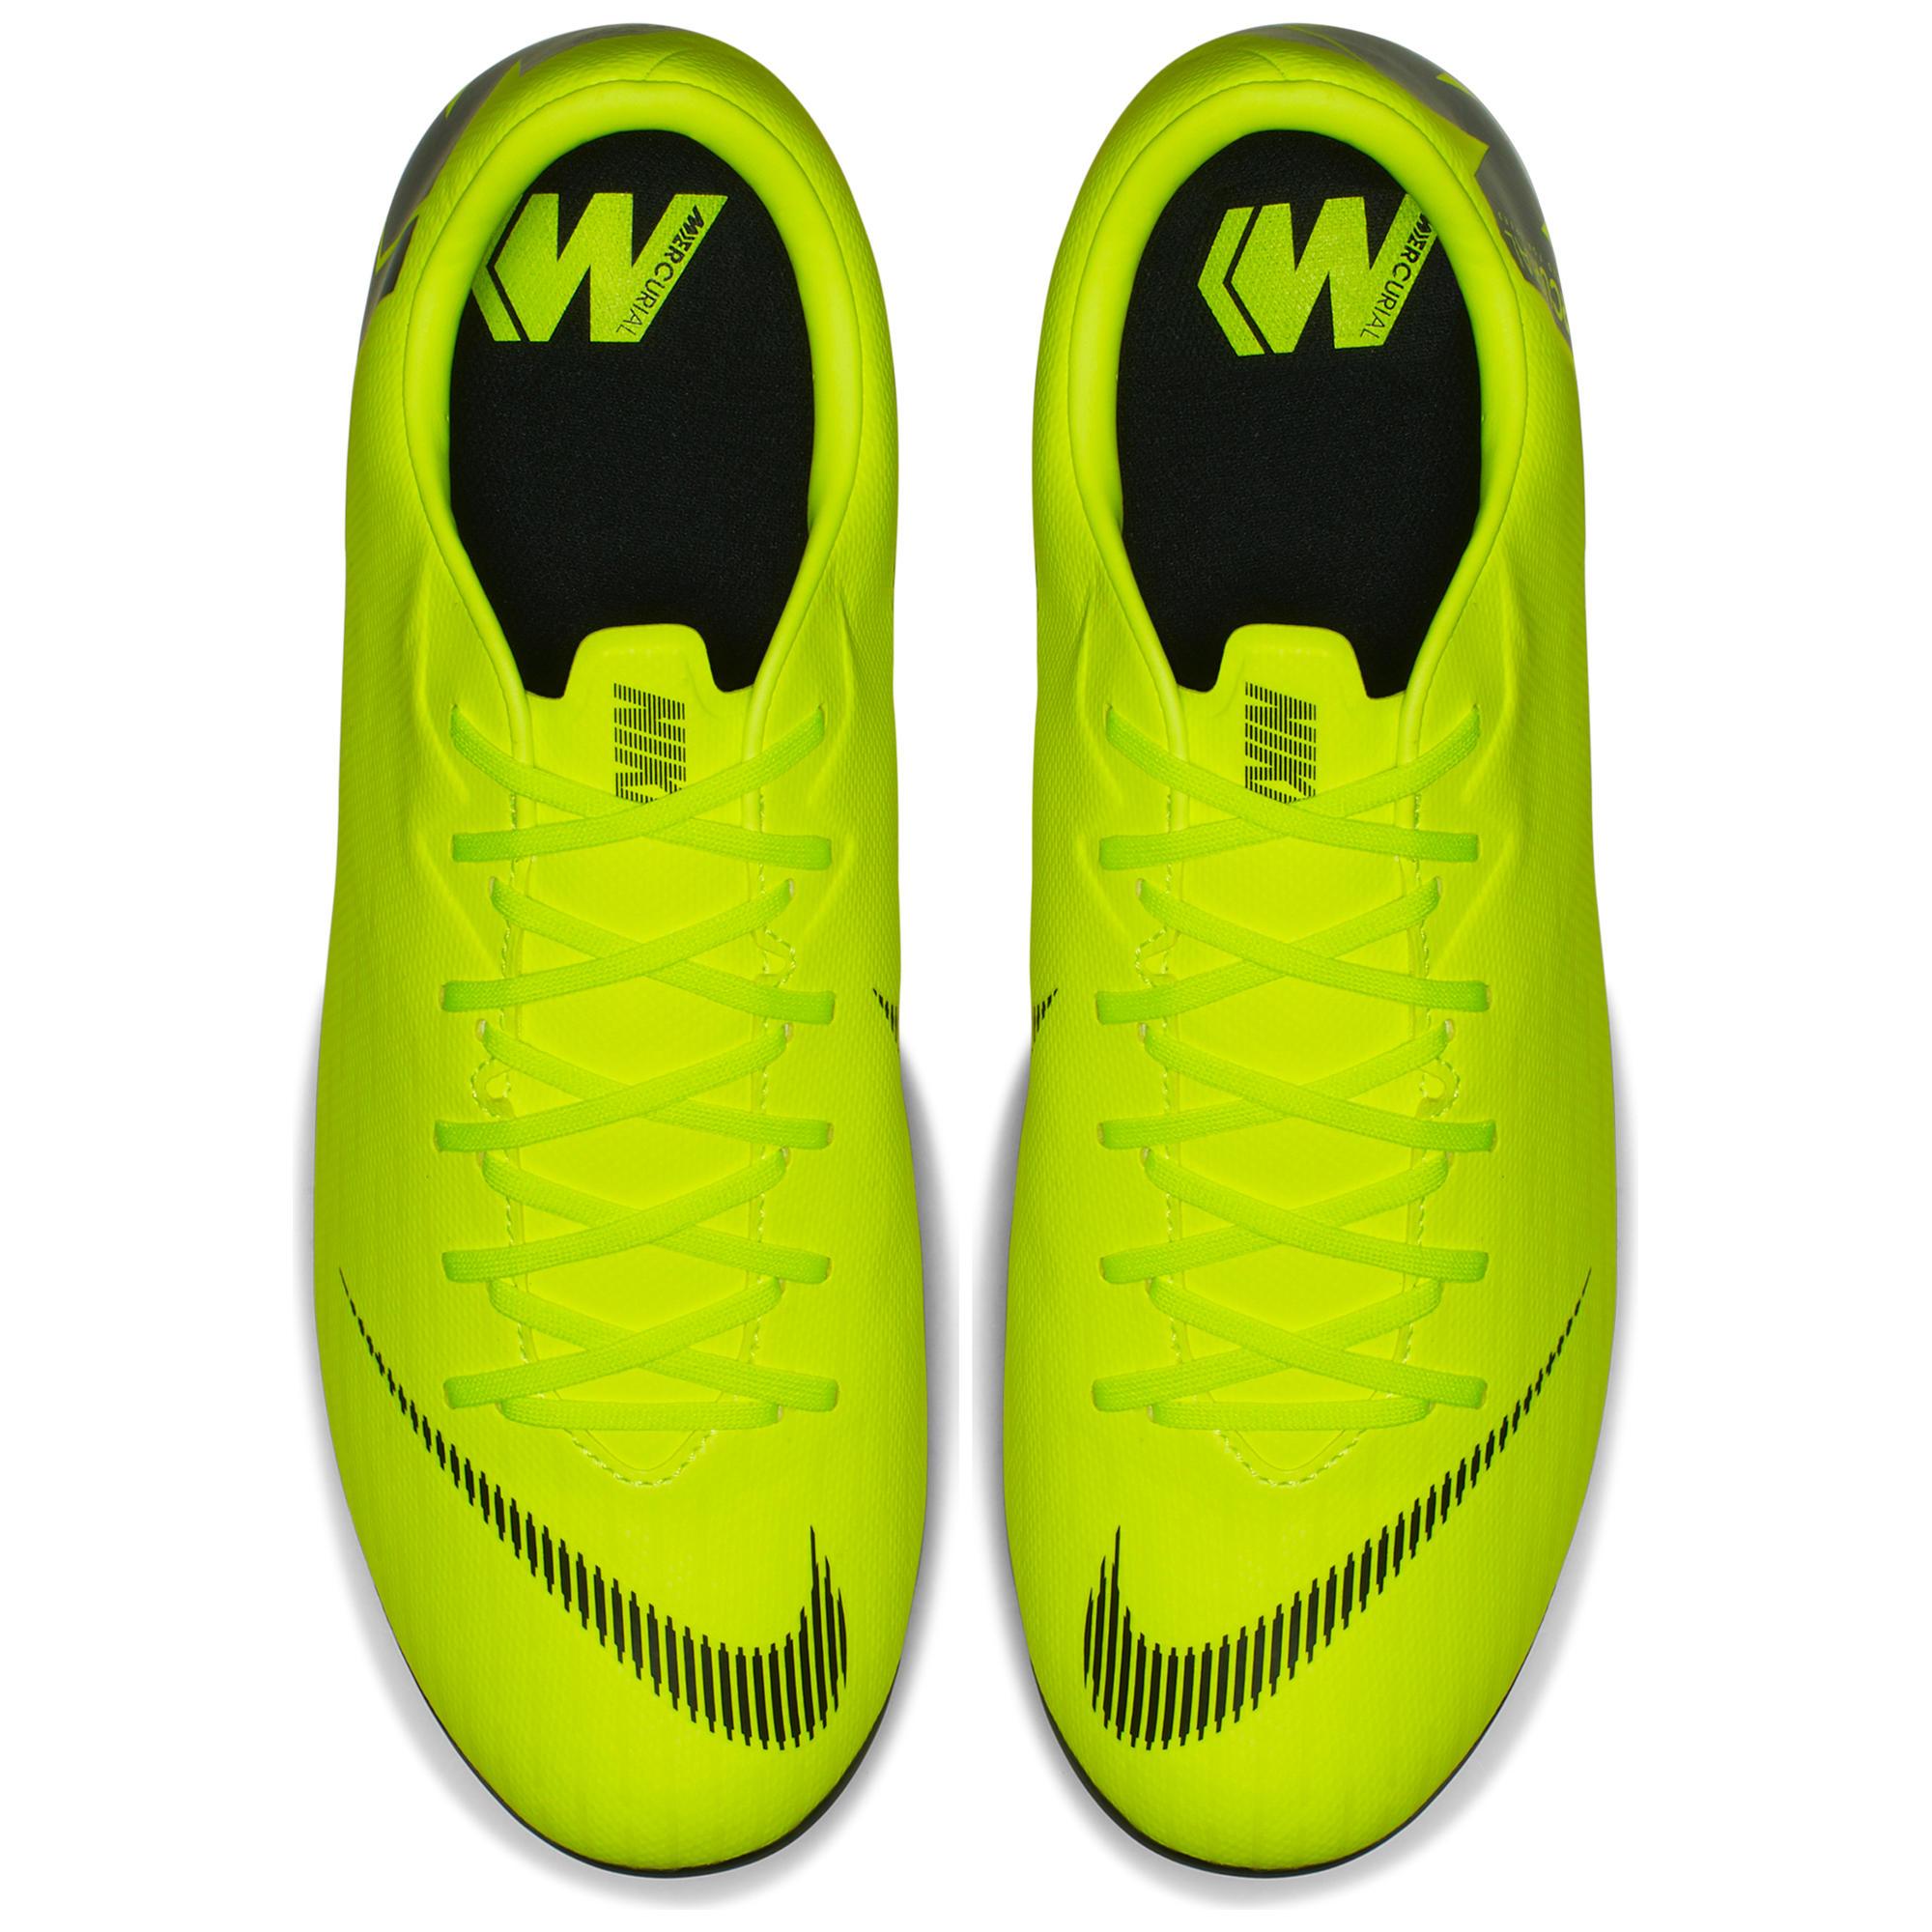 Football Chaussure Mercurial Mg De Vapor Adulte Xii Yf7gybv6